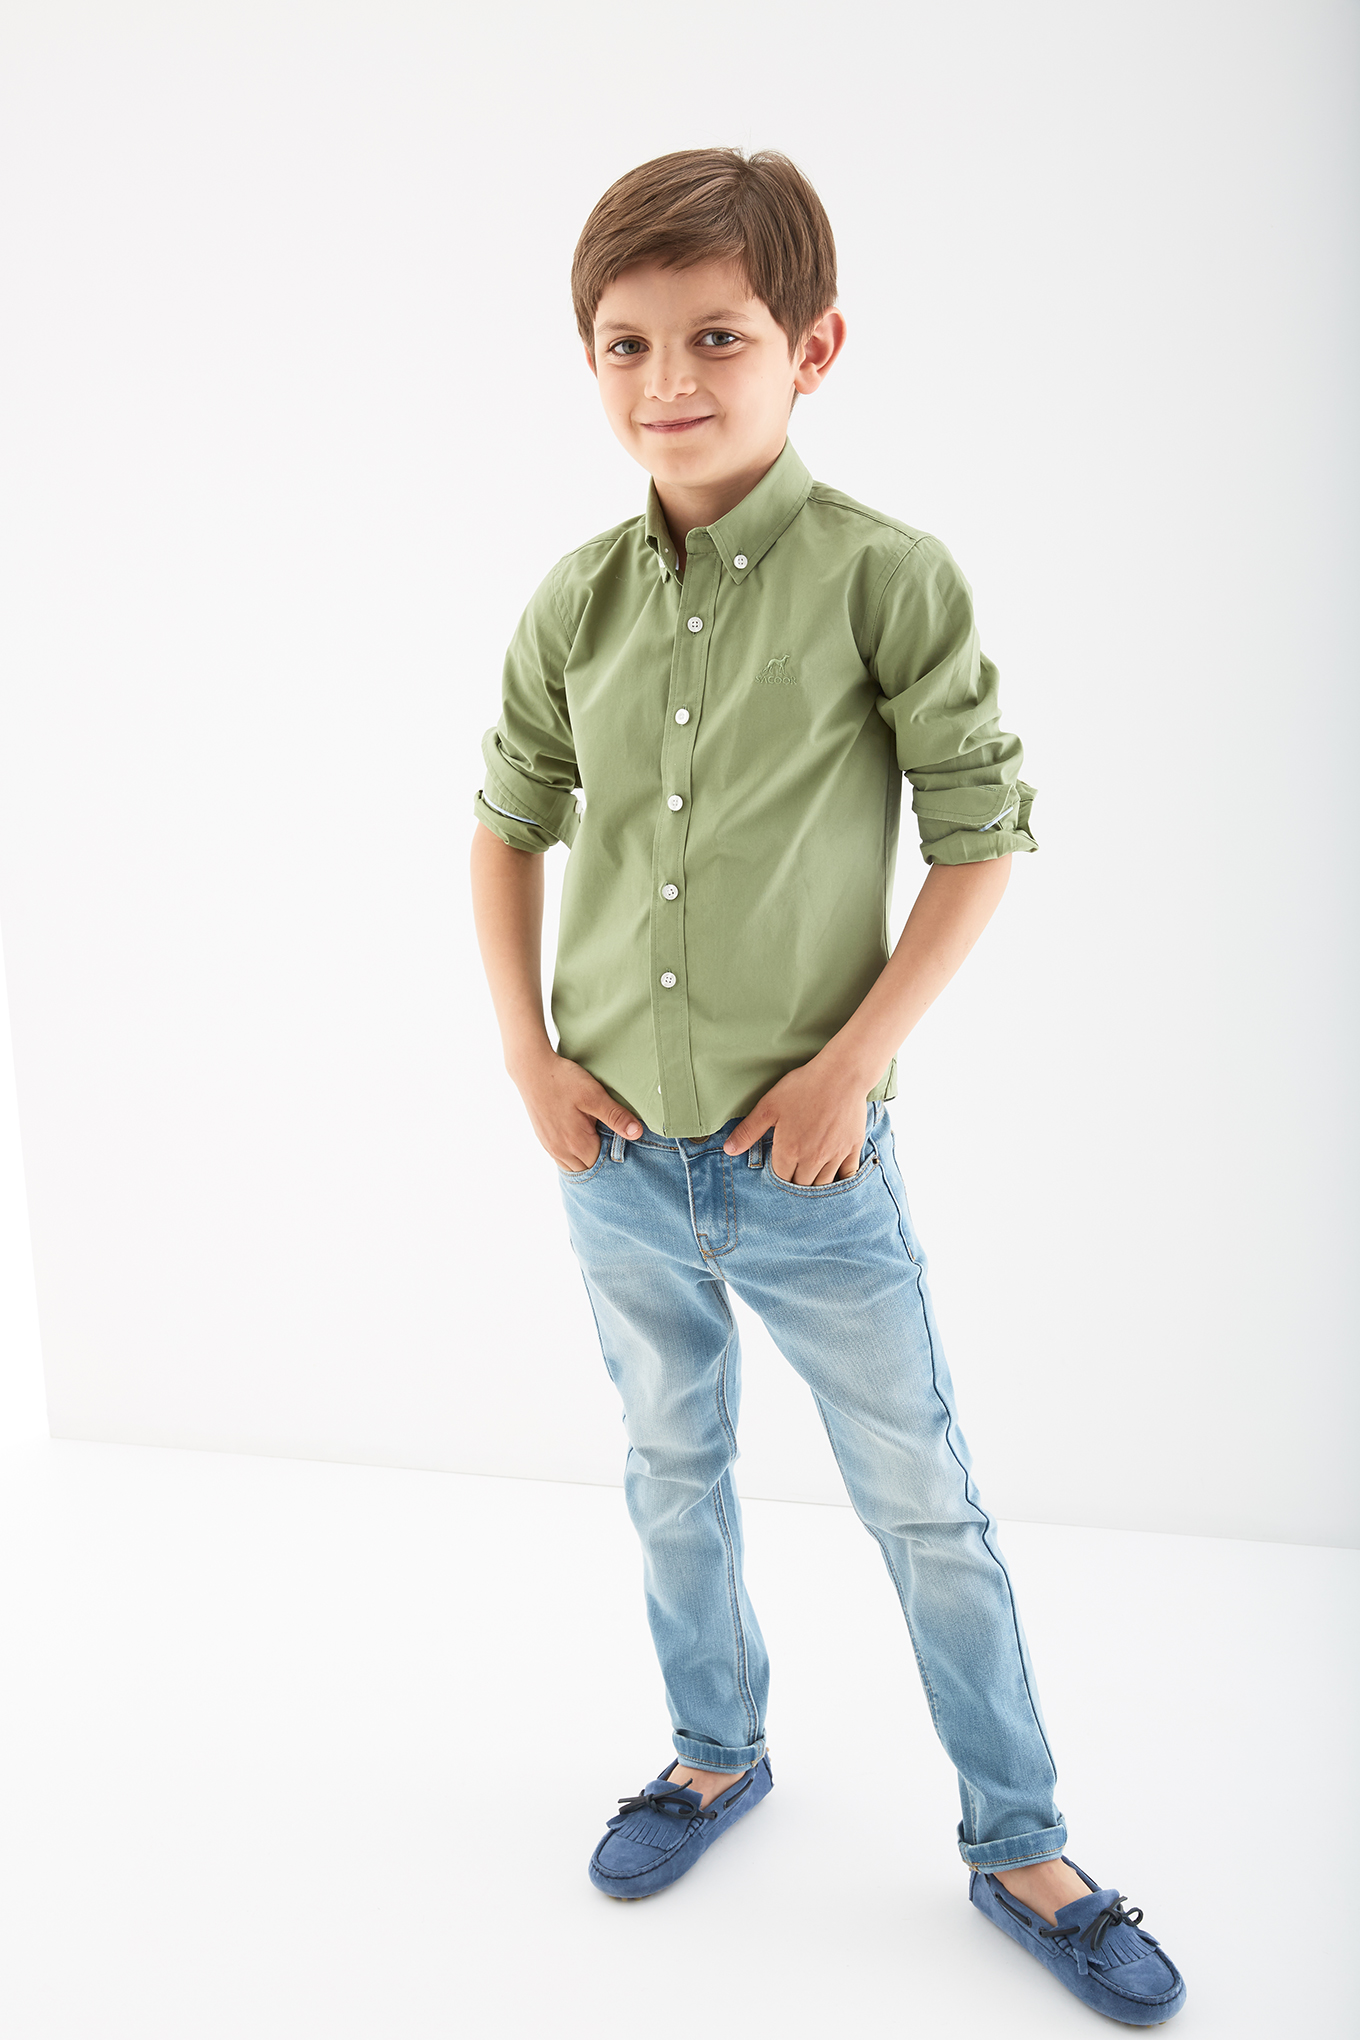 Camisa Verde Claro Casual Rapaz